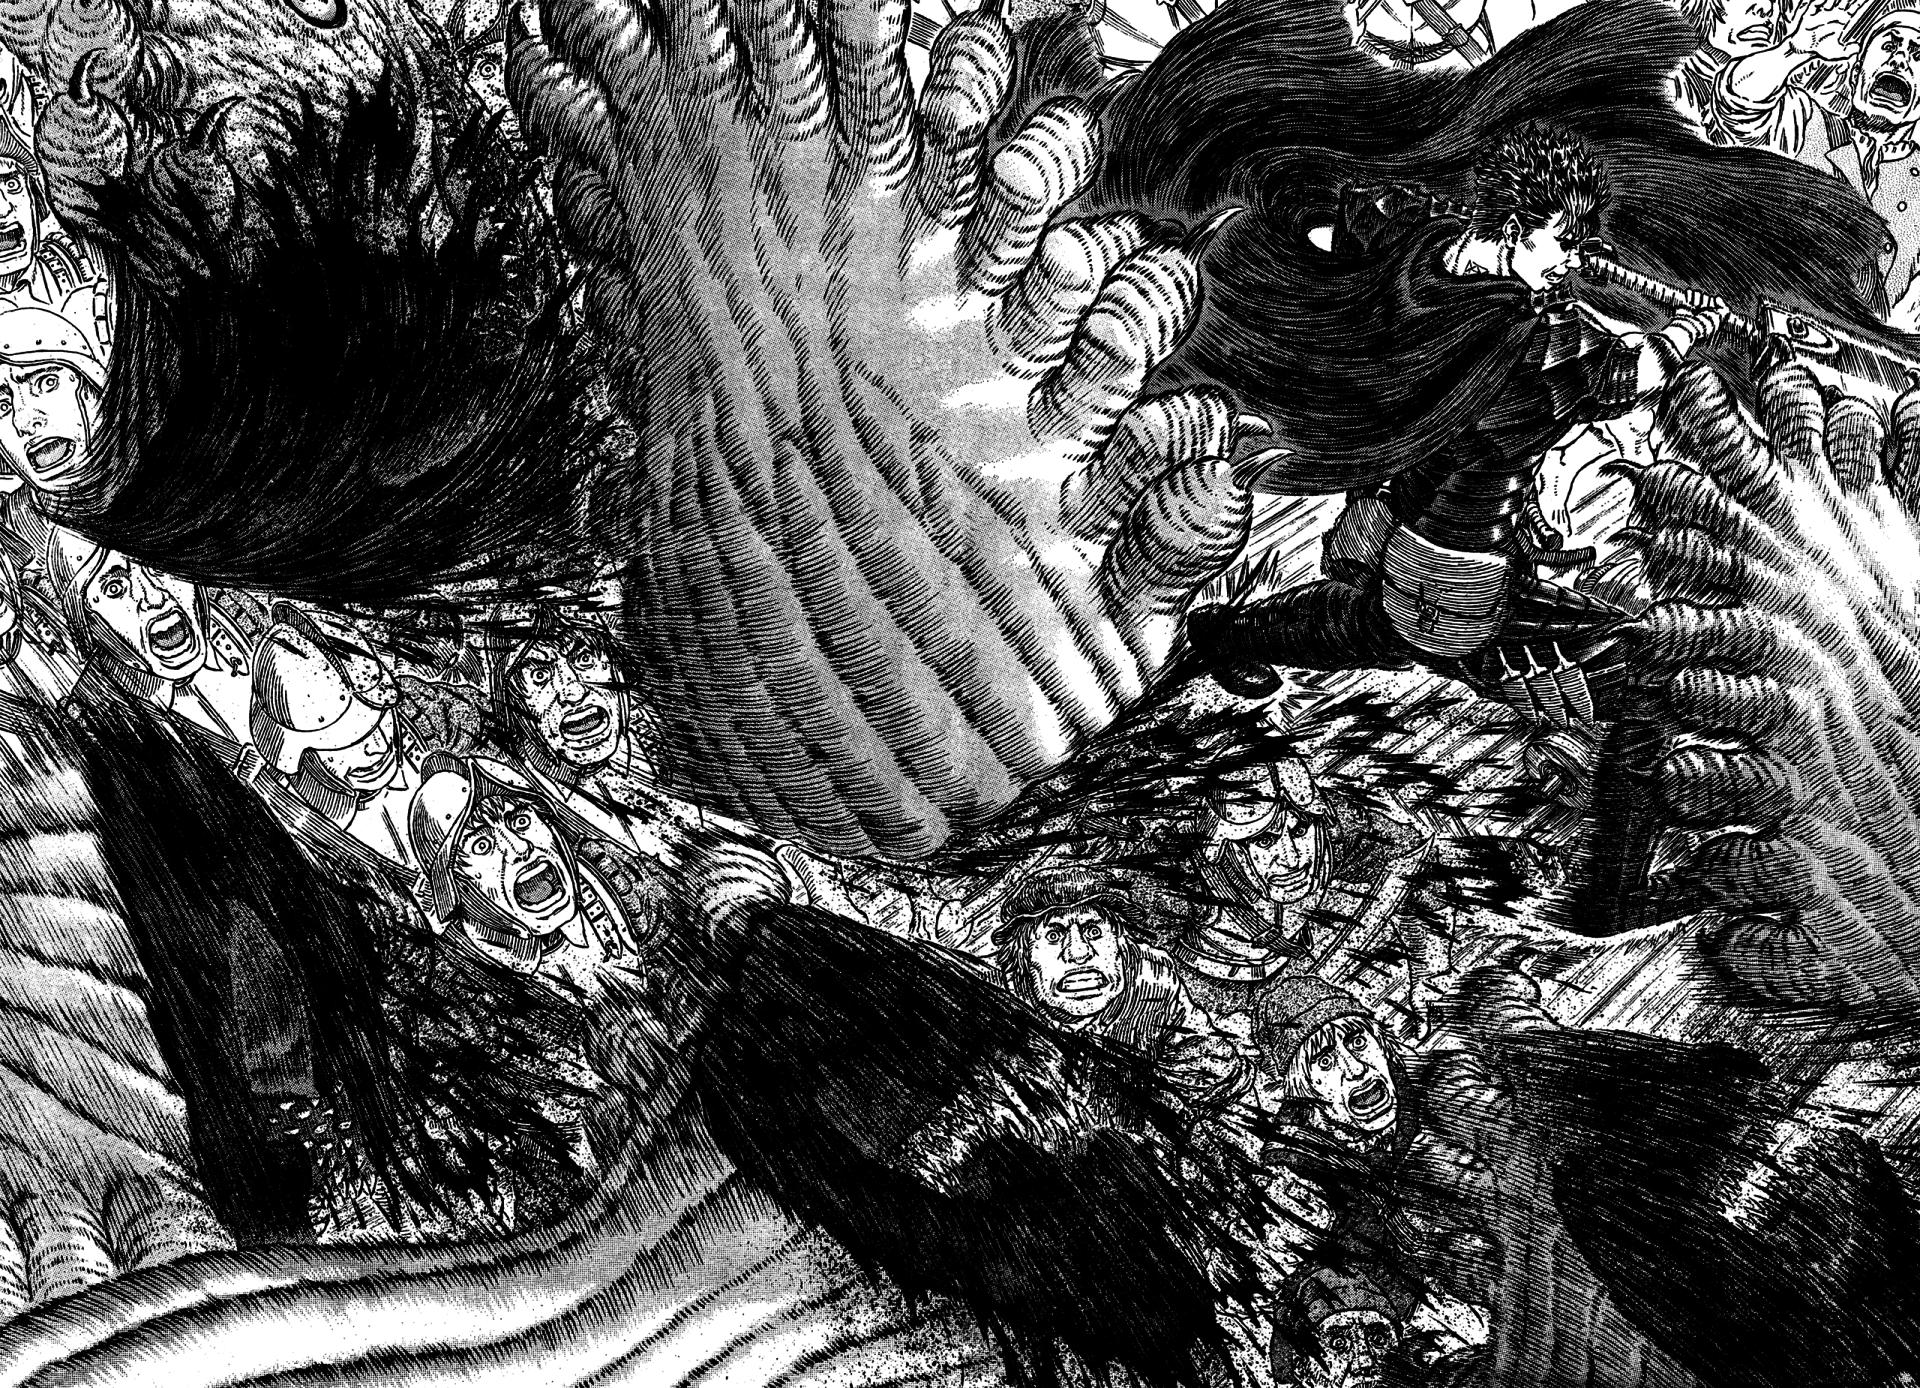 Berserk HD Wallpaper | Background Image | 2560x1850 | ID ...